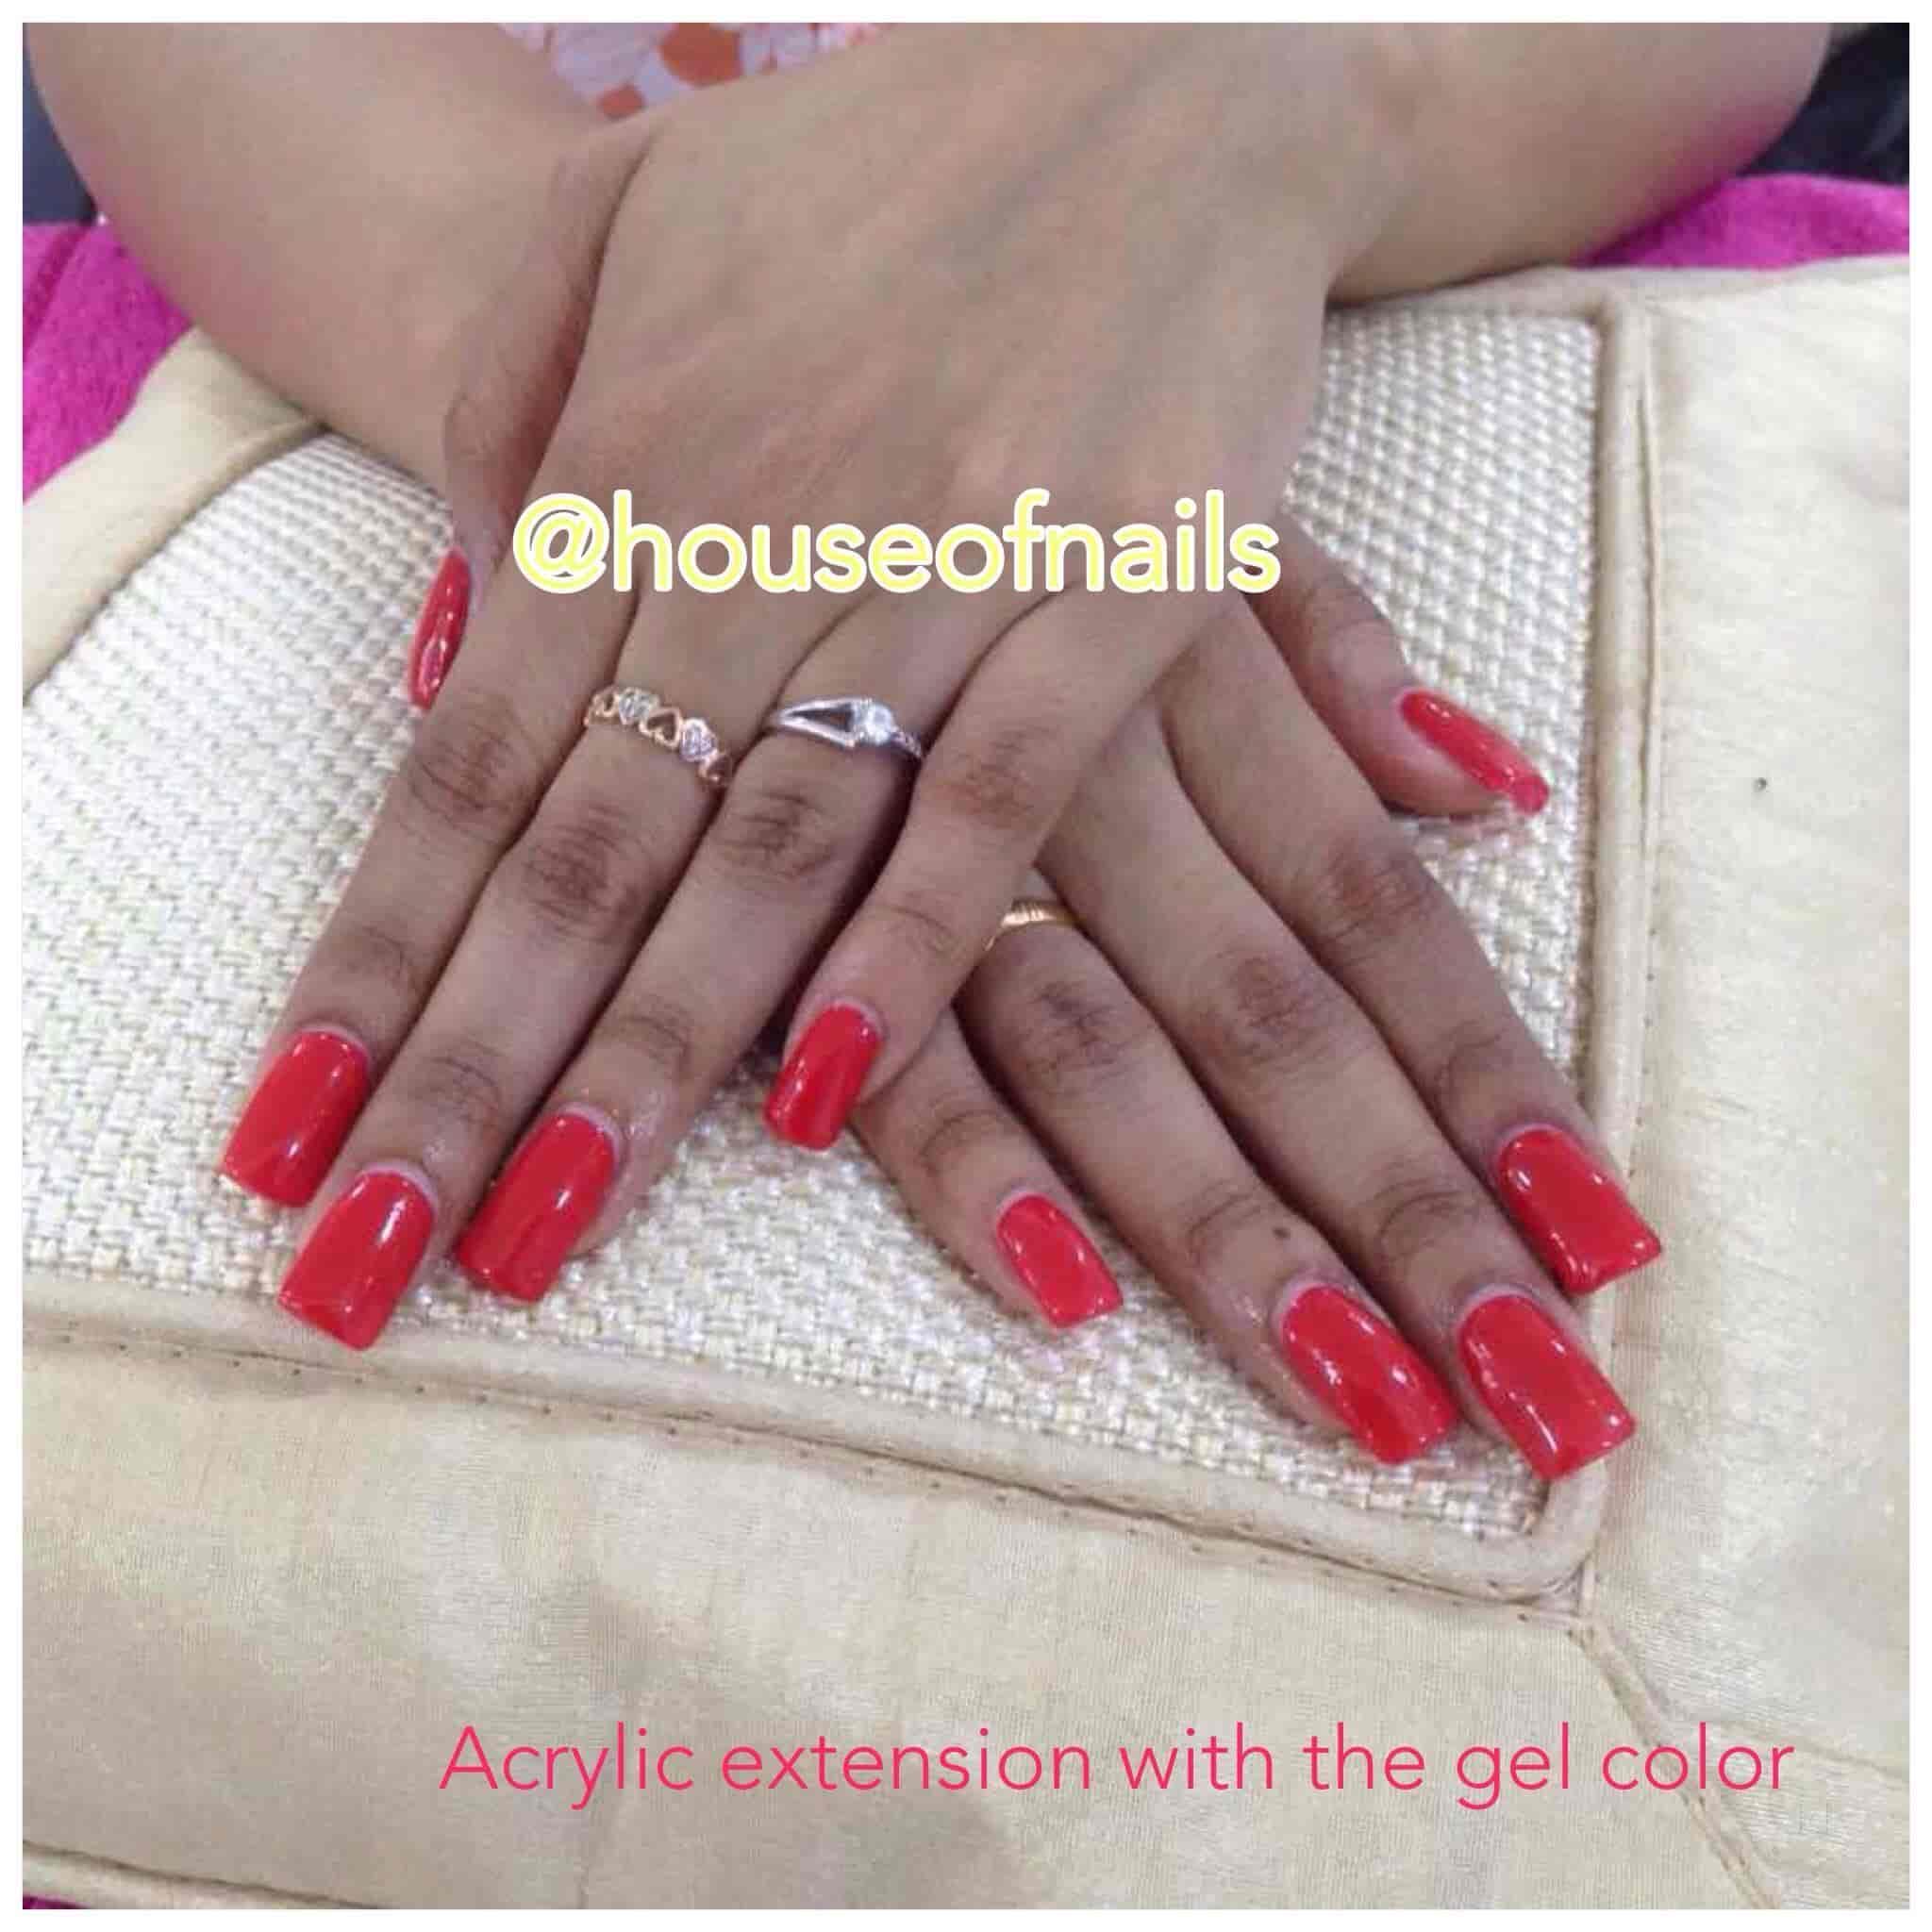 House Of Nails Photos, Ballygunge, Kolkata- Pictures & Images ...